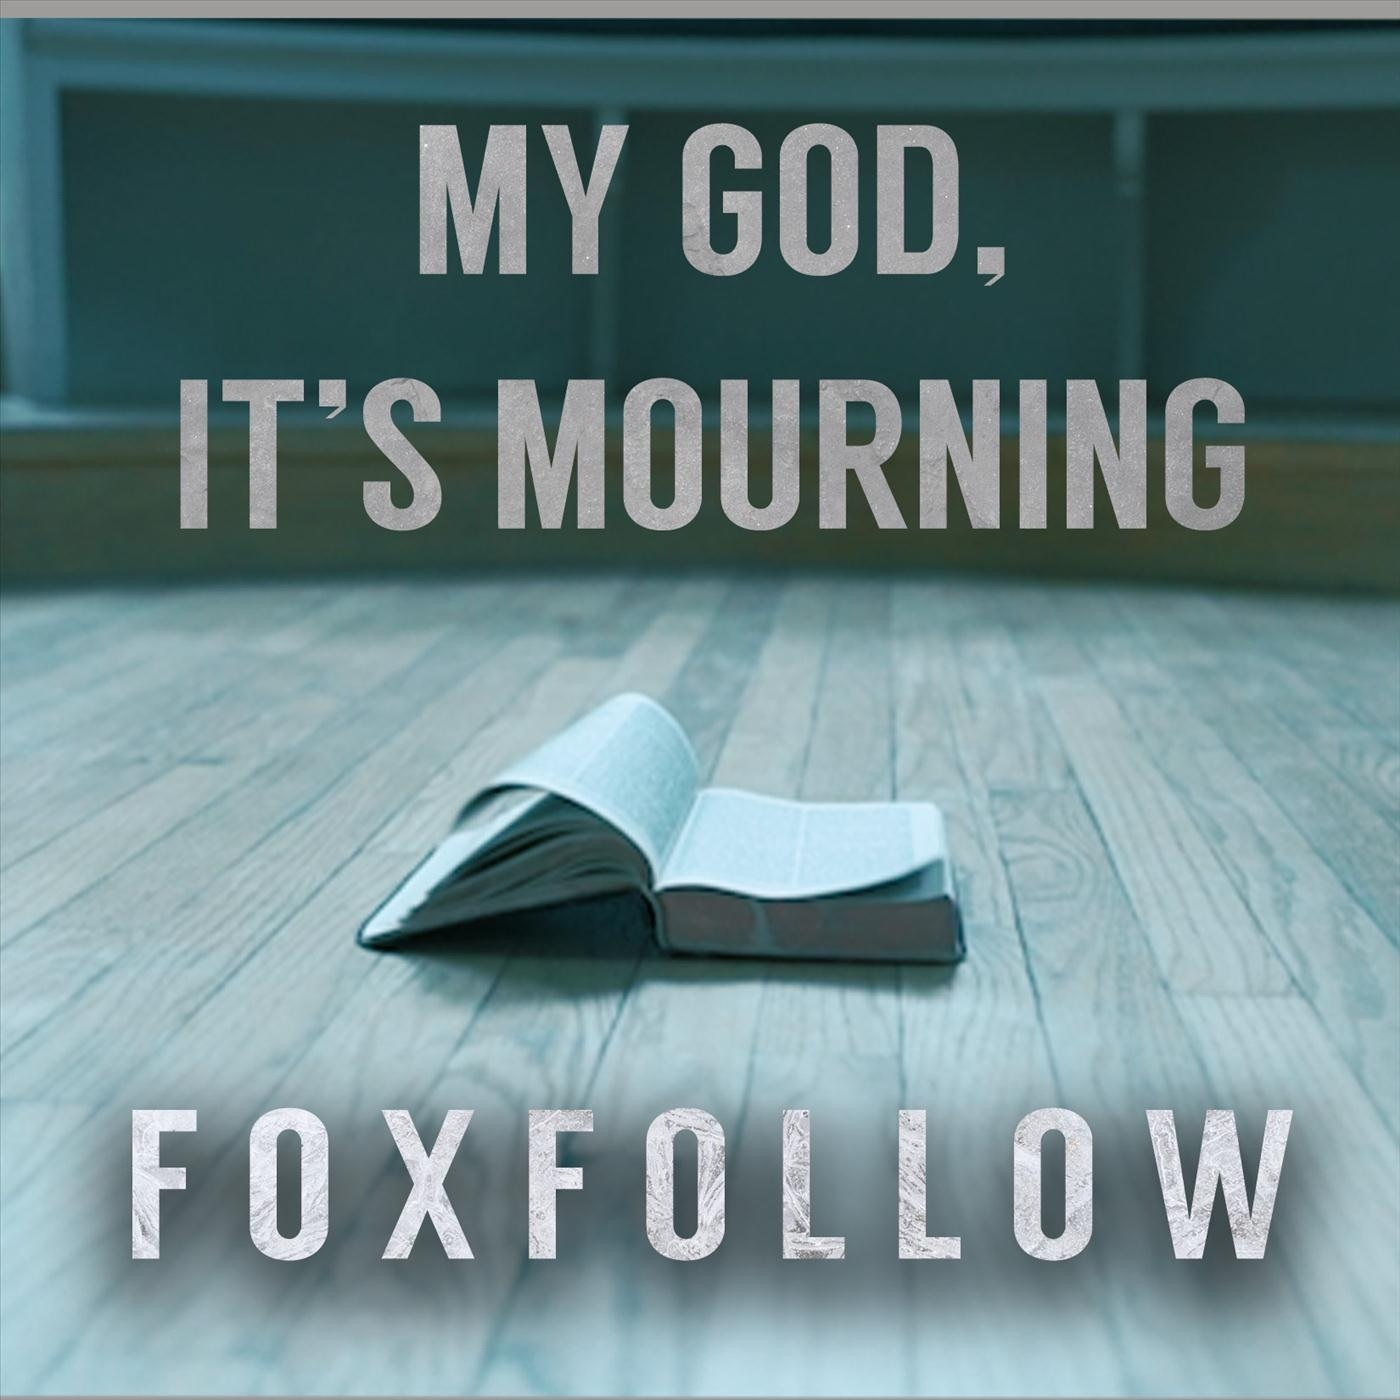 Foxfollow - My God, It's Mourning [Single] (2019)